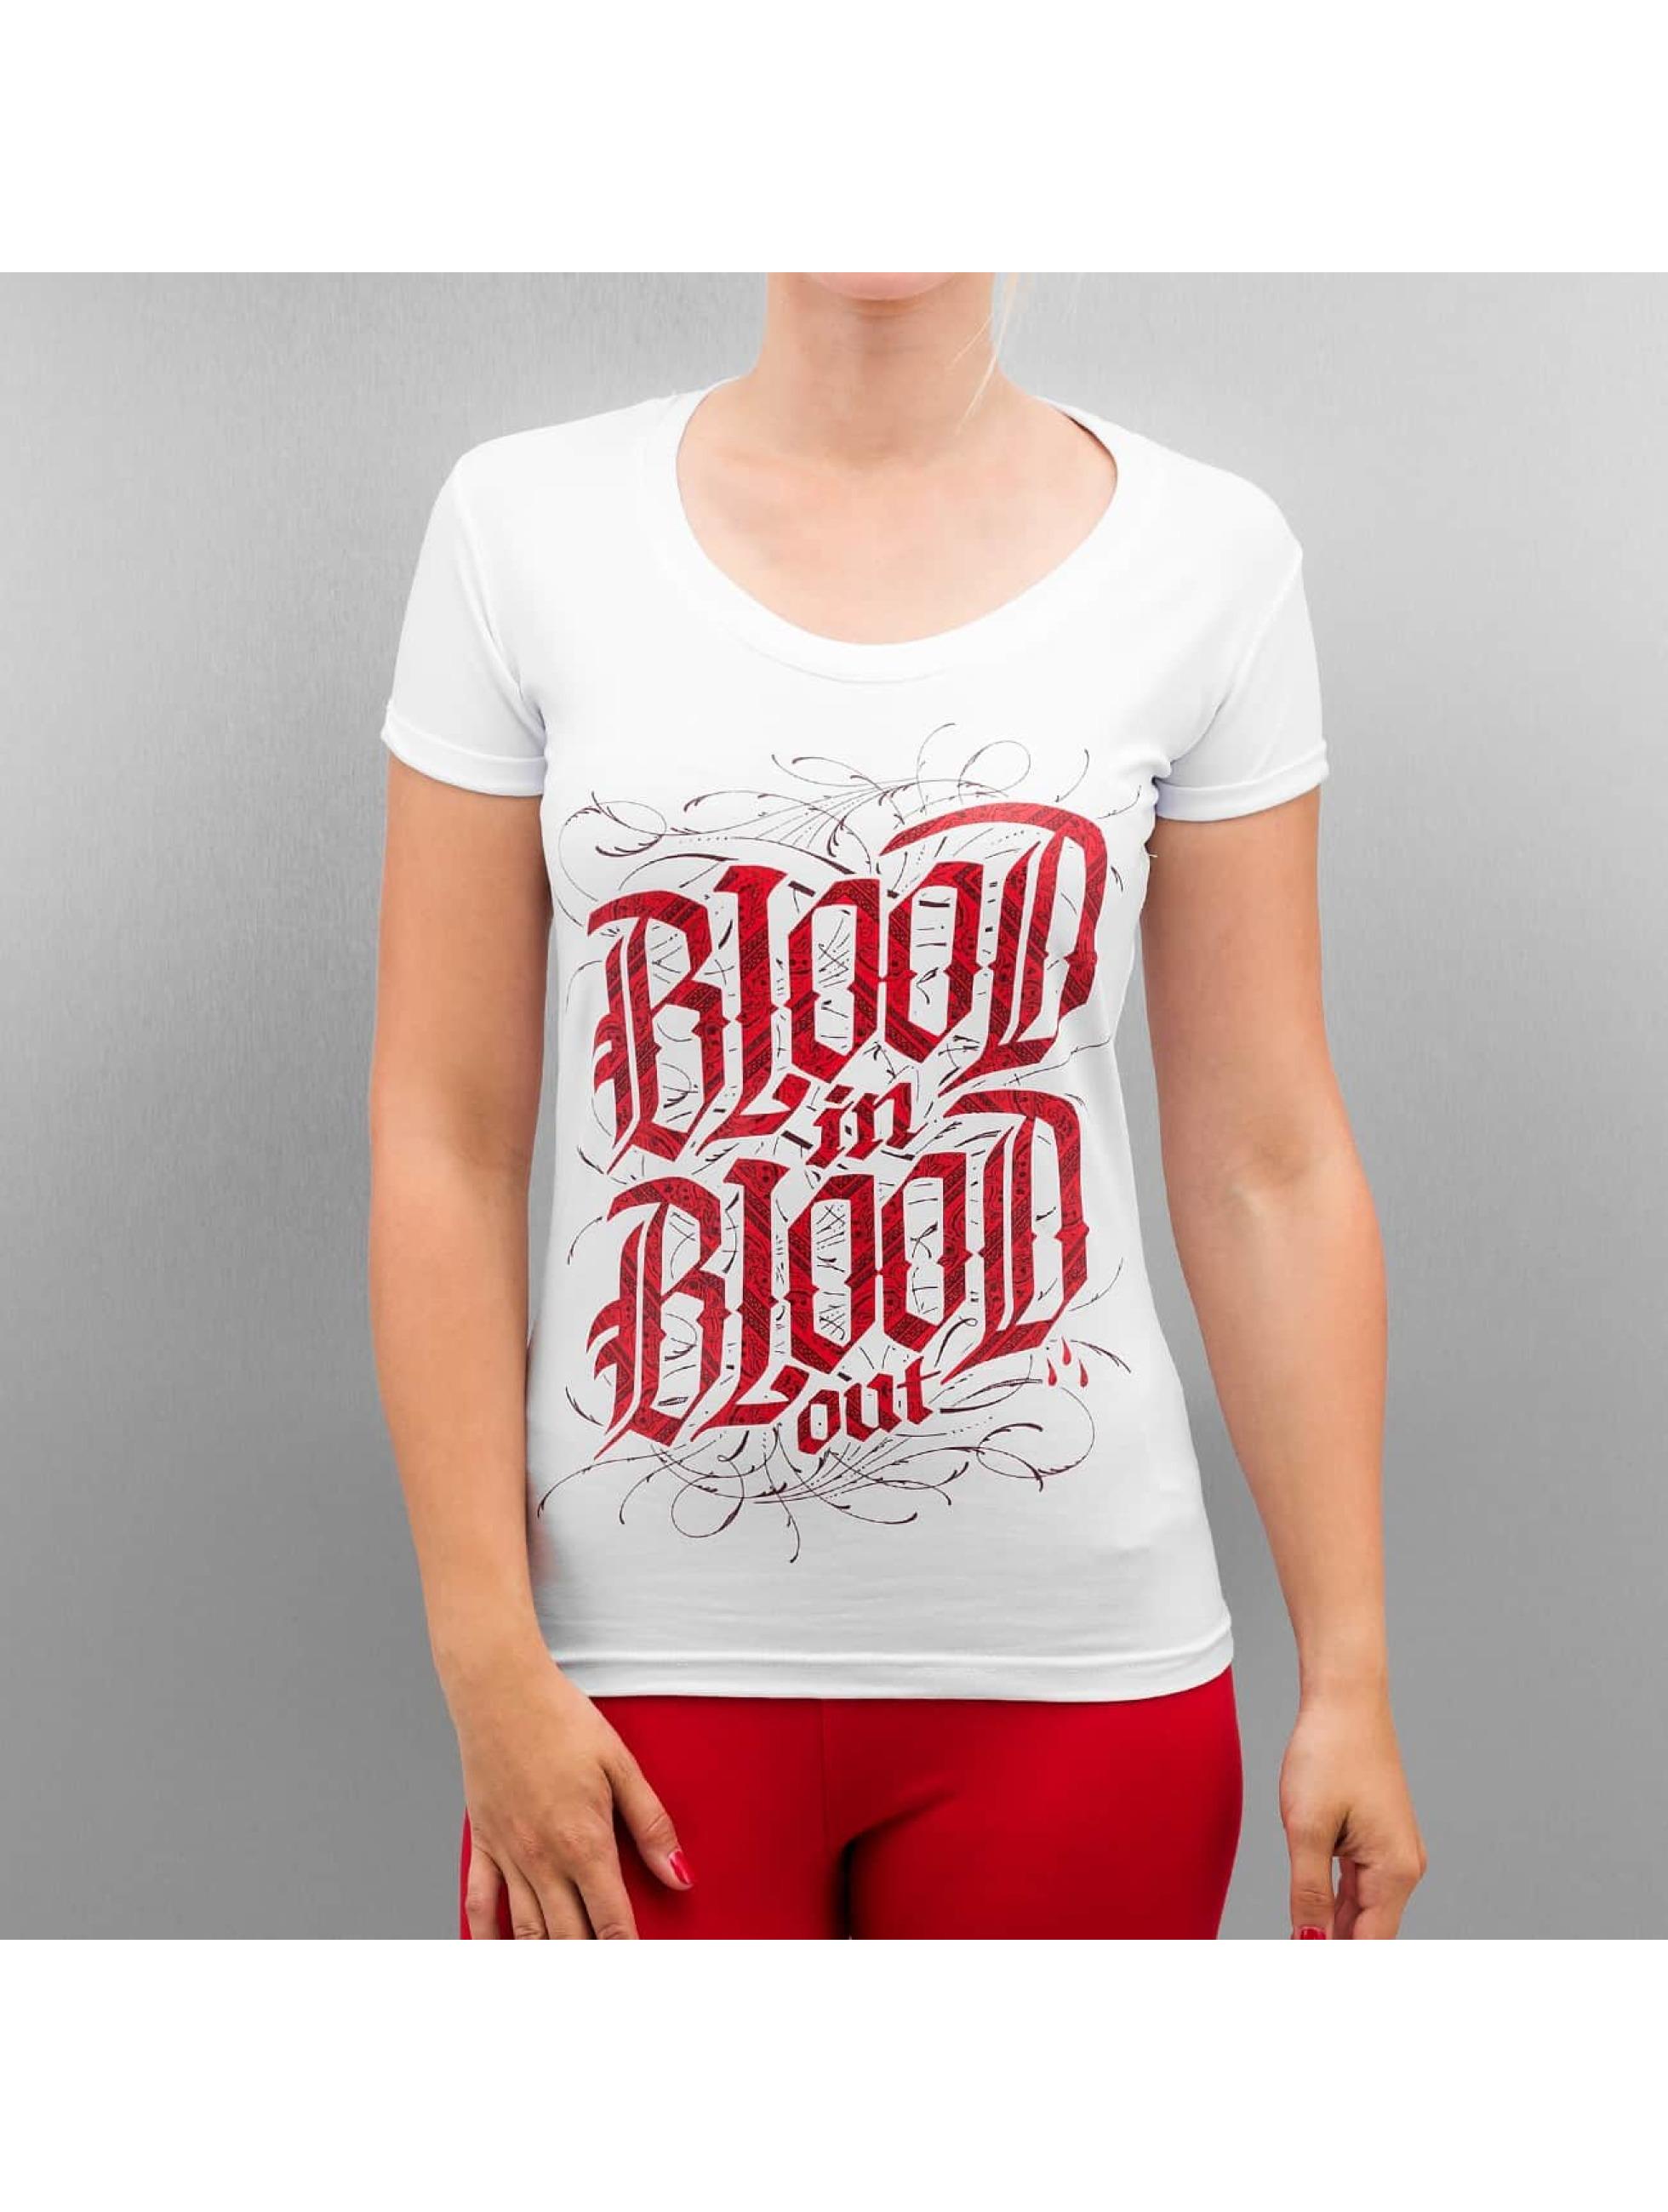 Blood In Blood Out Frauen T-Shirt Logo in weiß